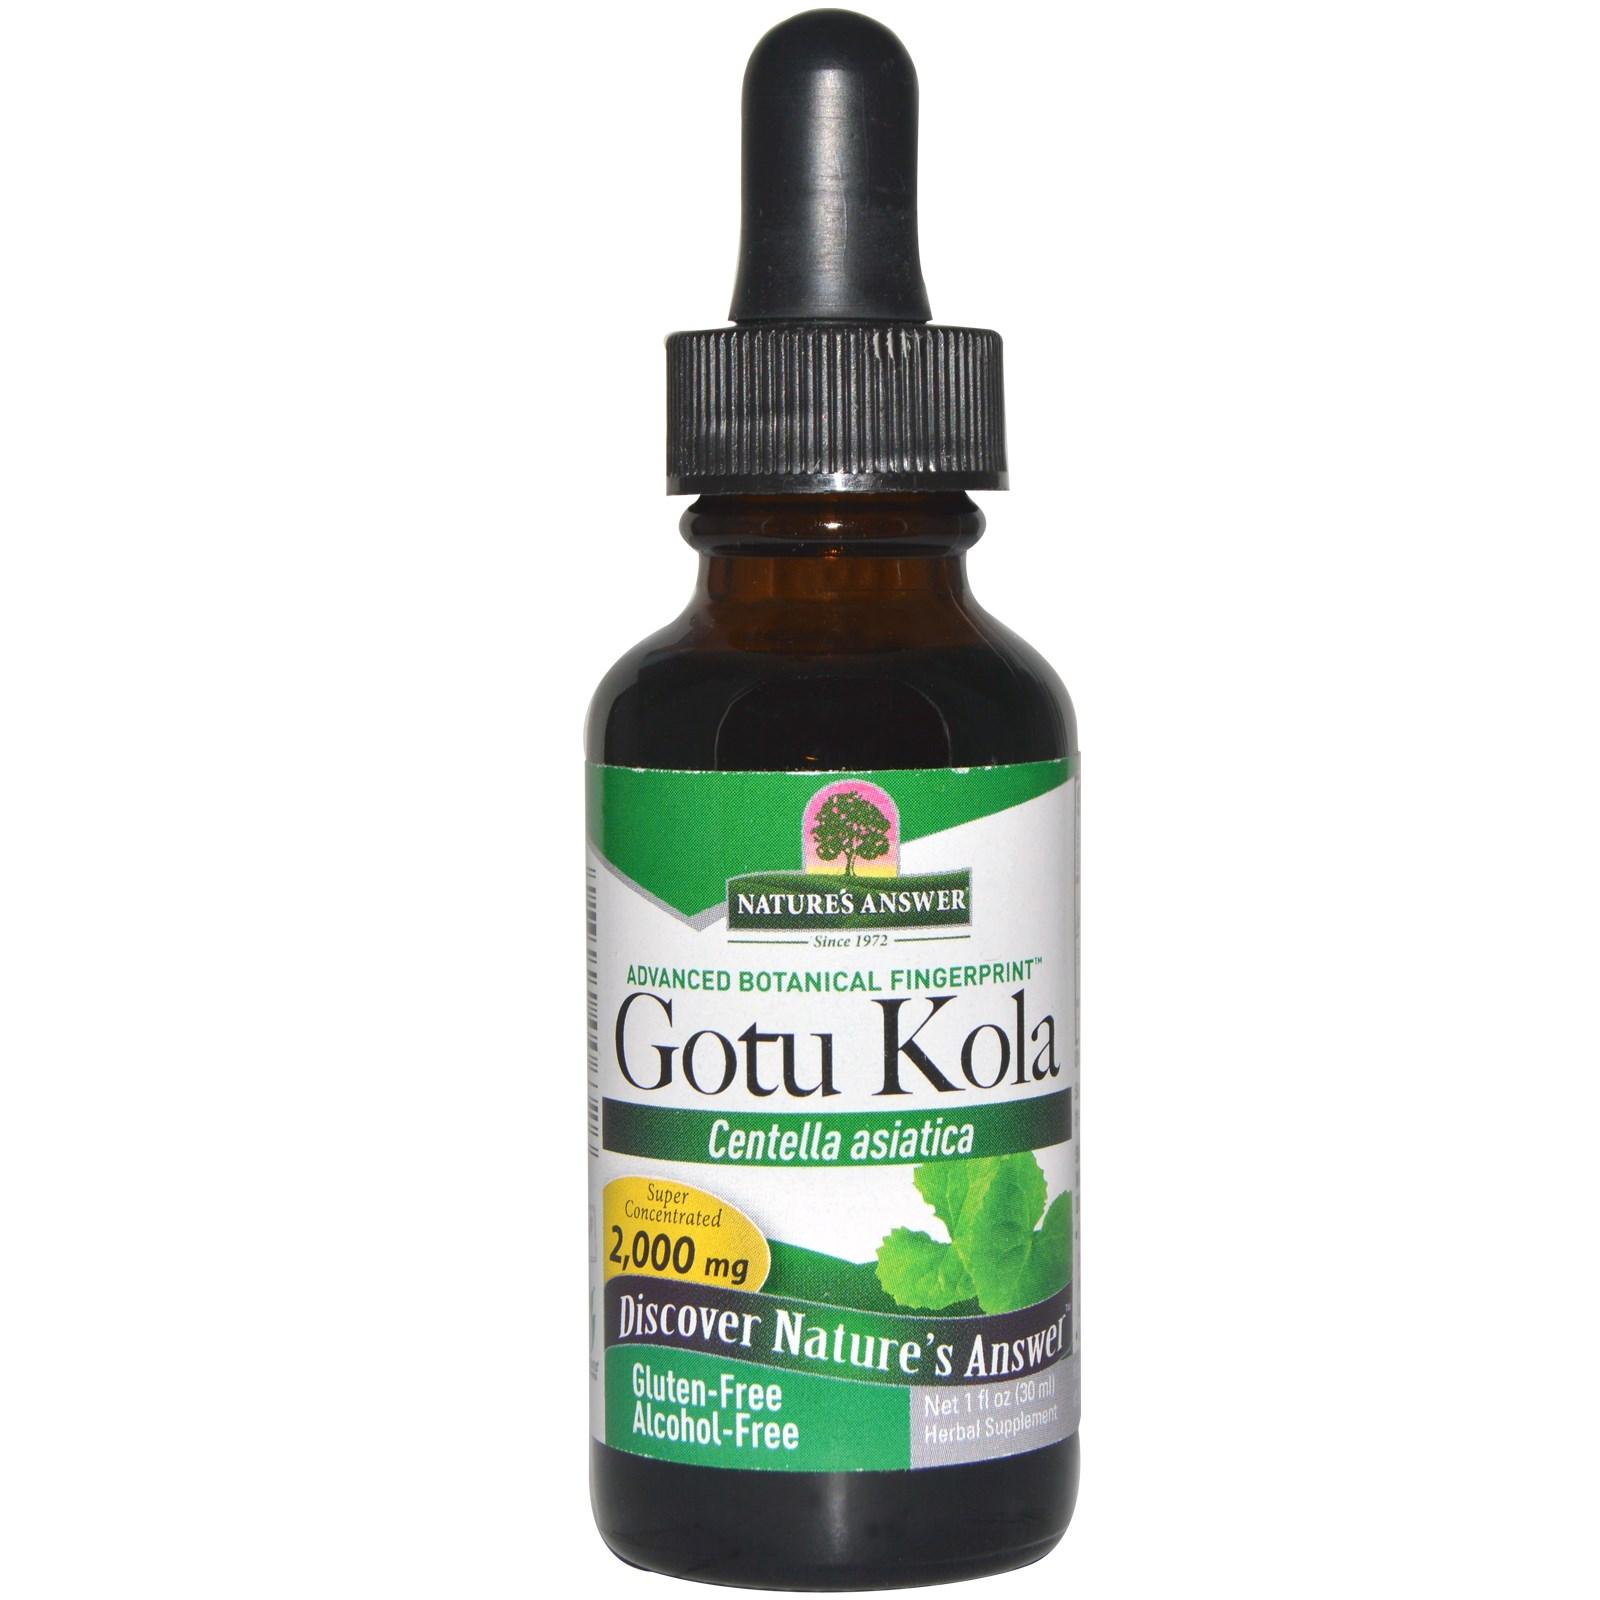 Image of Gotu Kola, Alcohol-Free (30 ml) - Nature's Answer 0083000006326